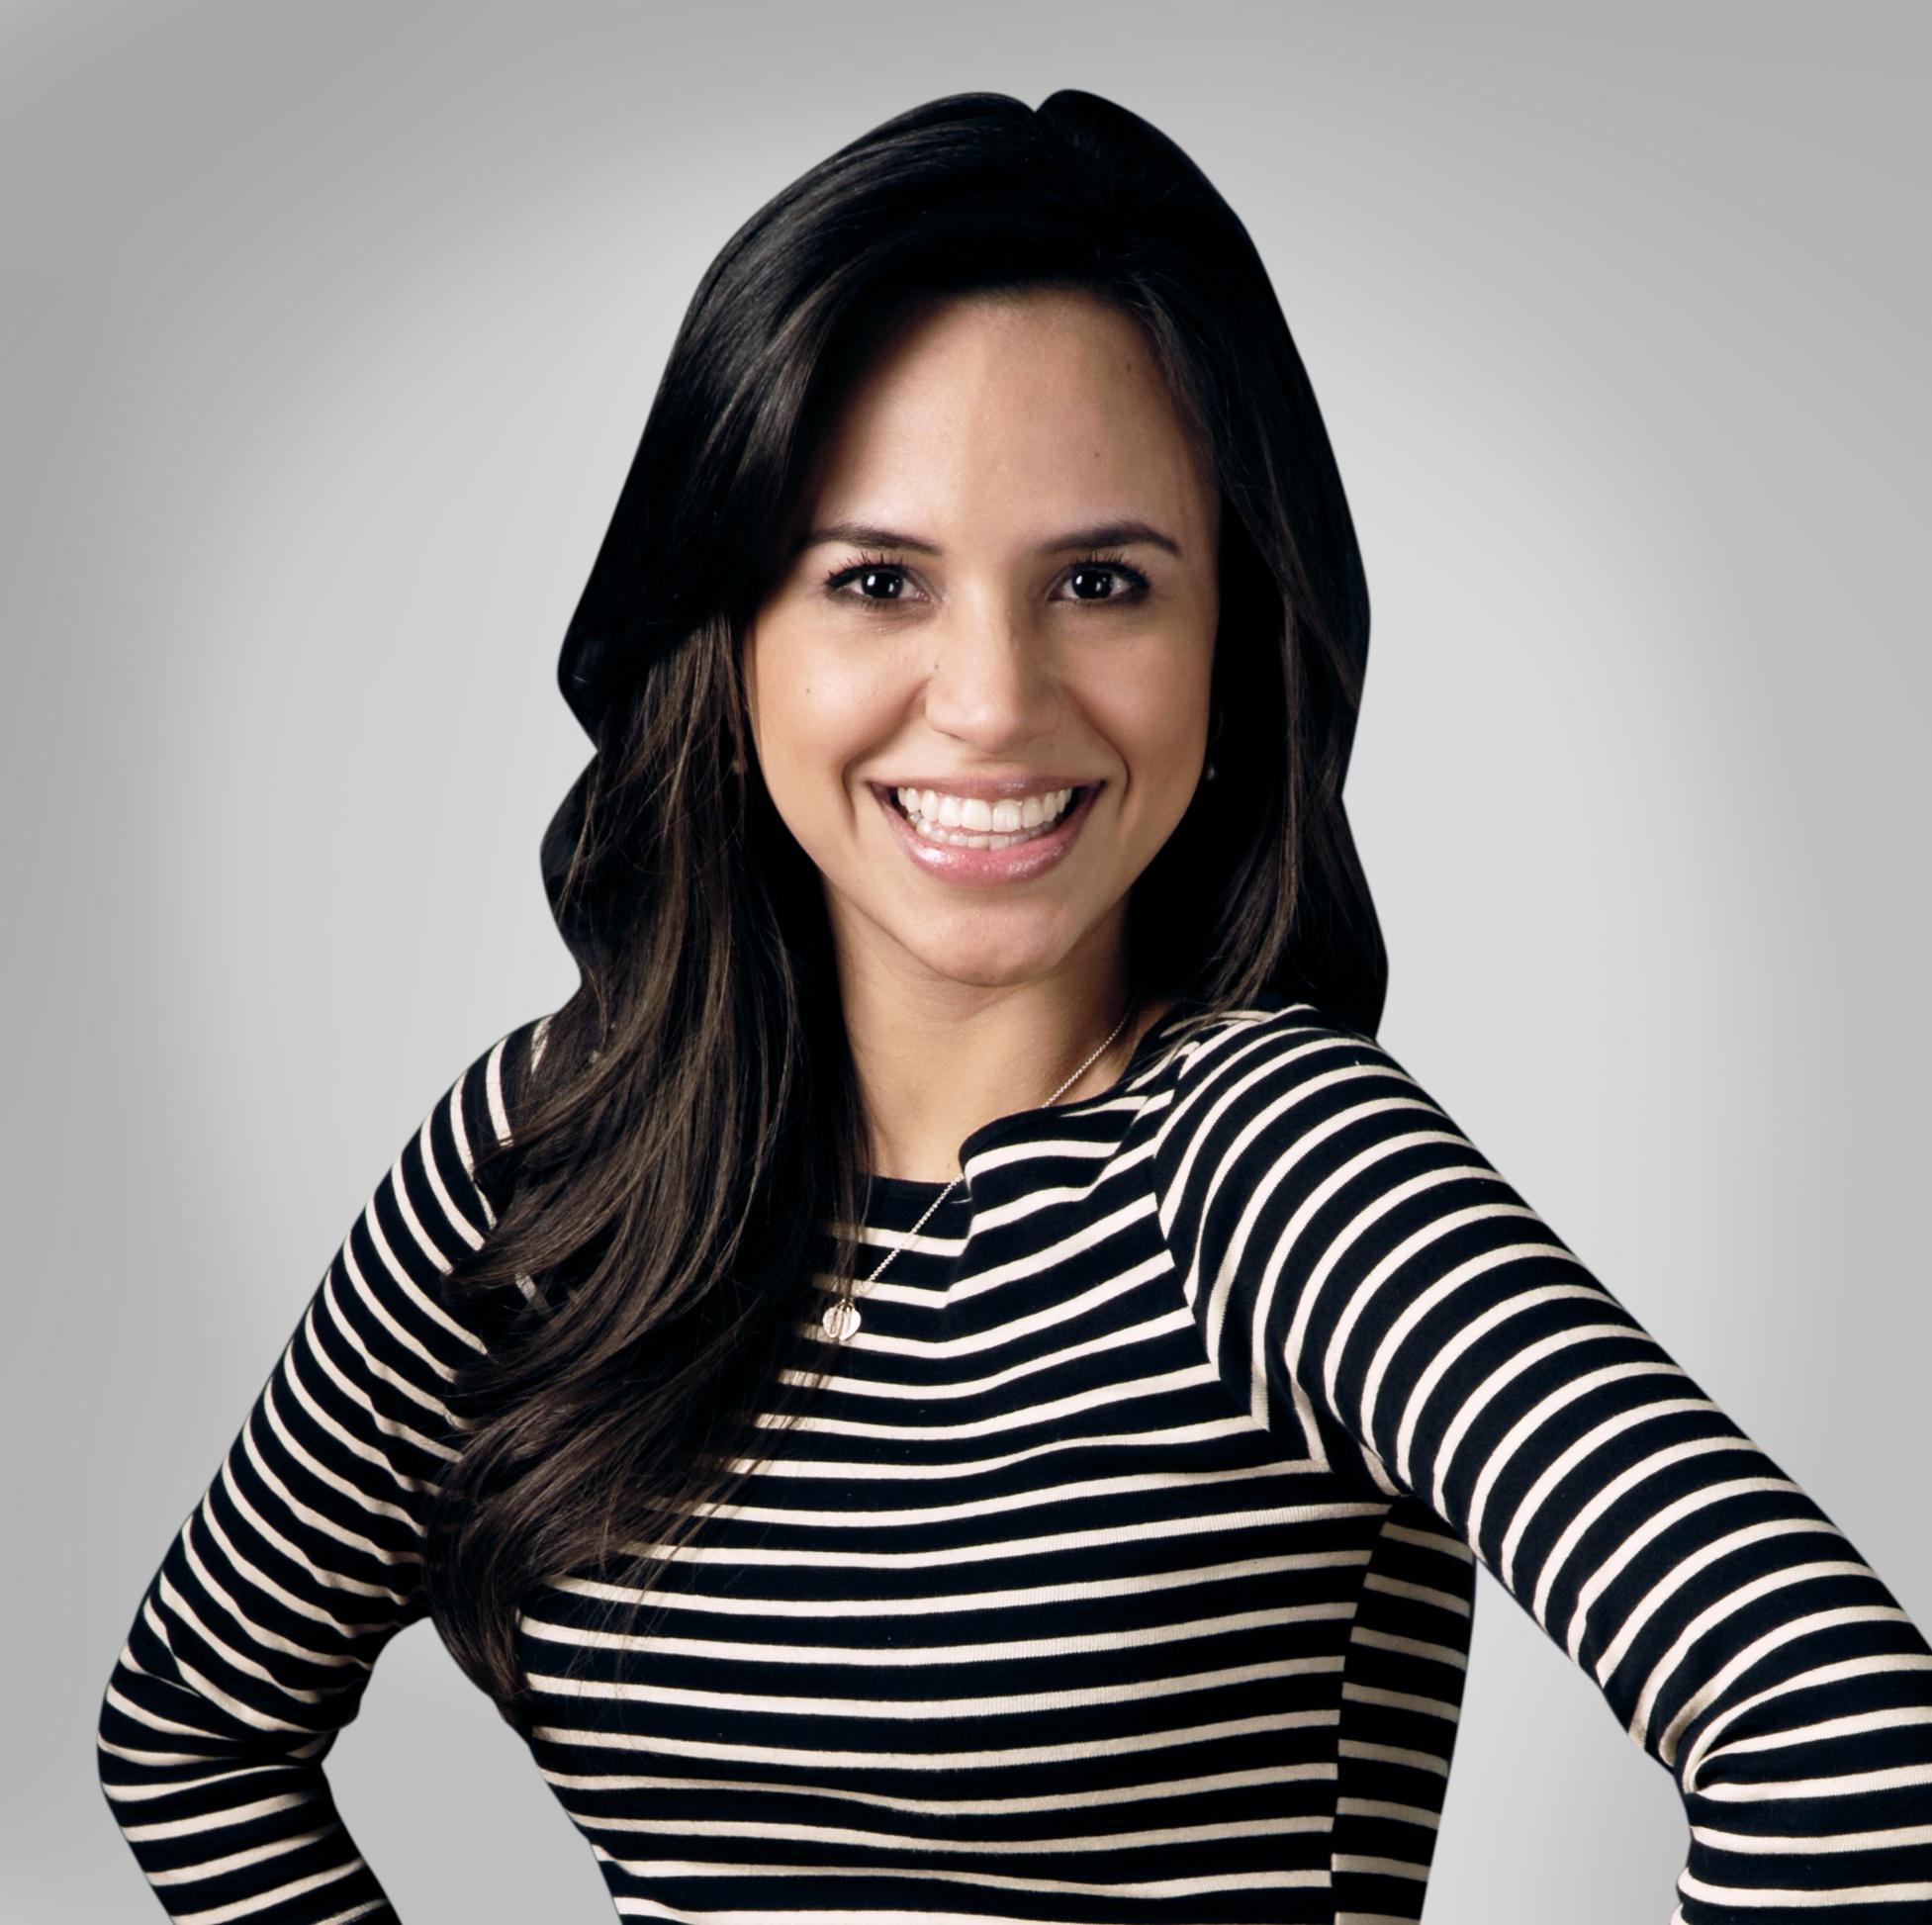 Gabriela Sandoval